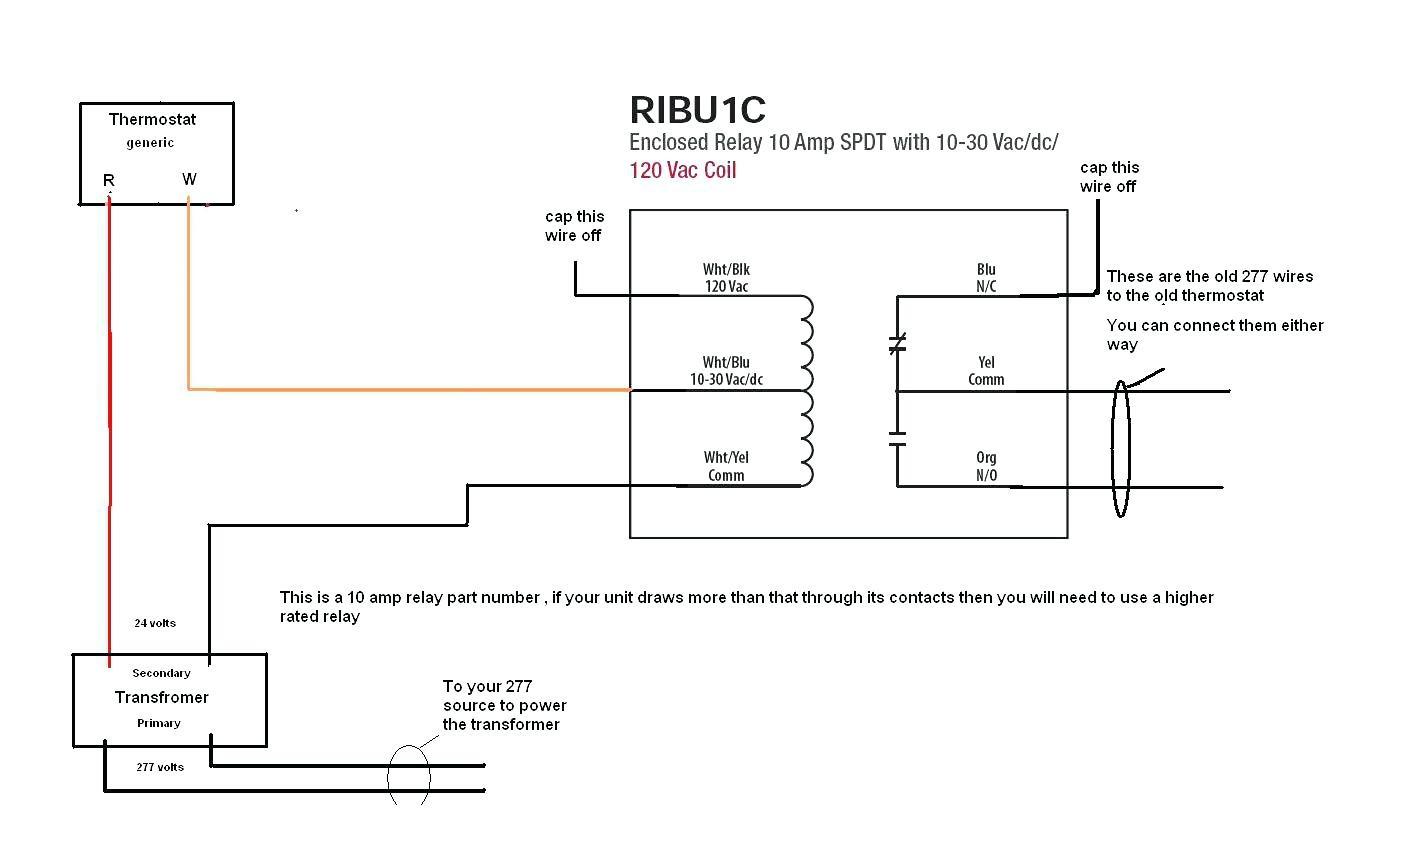 Garmin Wire Diagram - Catalogue of Schemas on